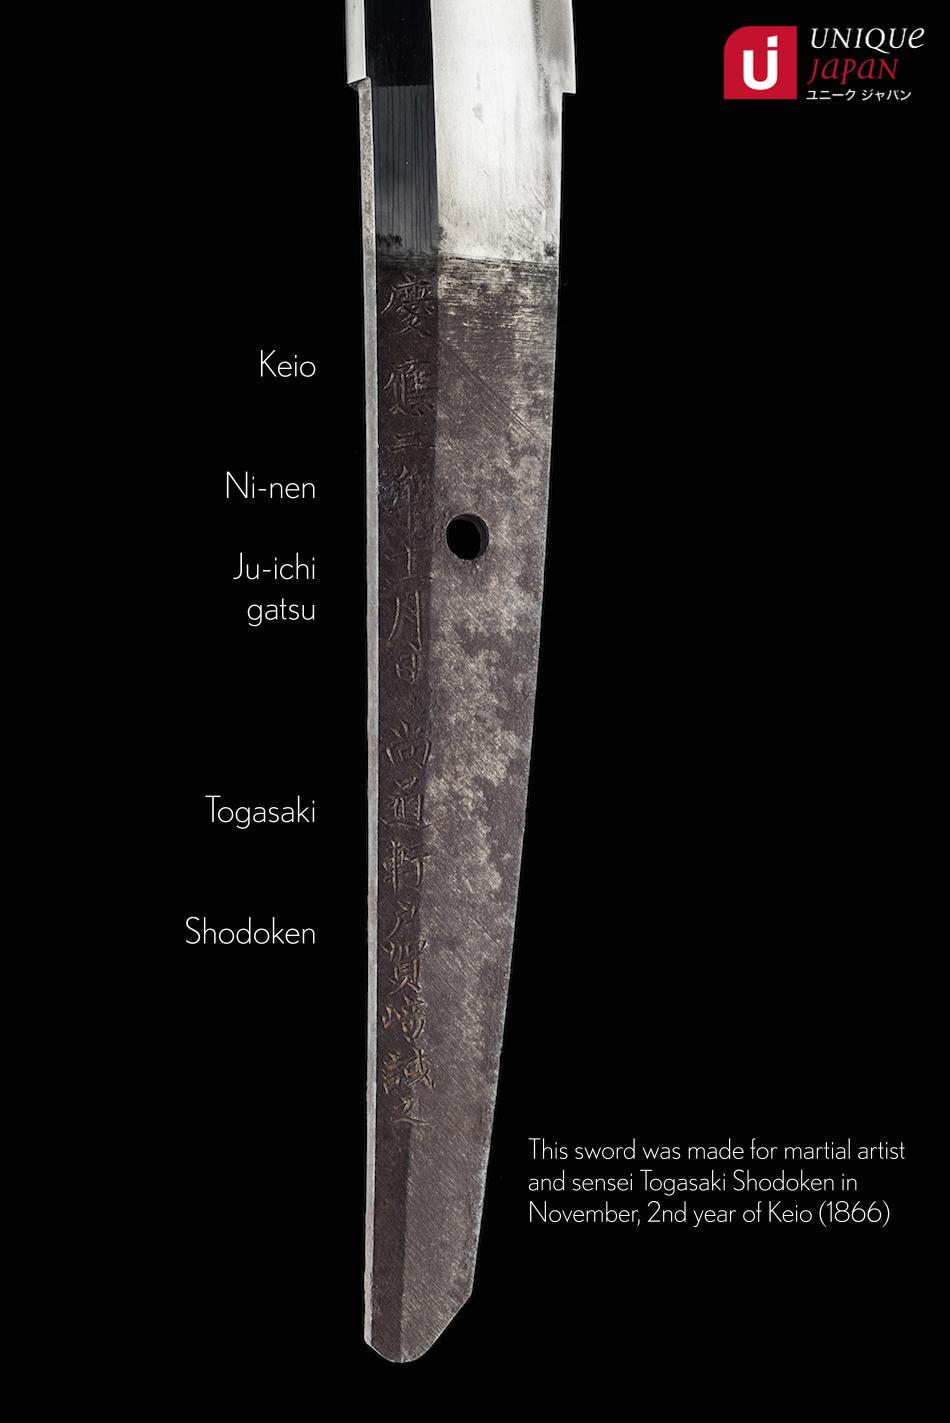 A Hisayuki Wakizashi ujwa134 Nakago Ura- Unique Japan